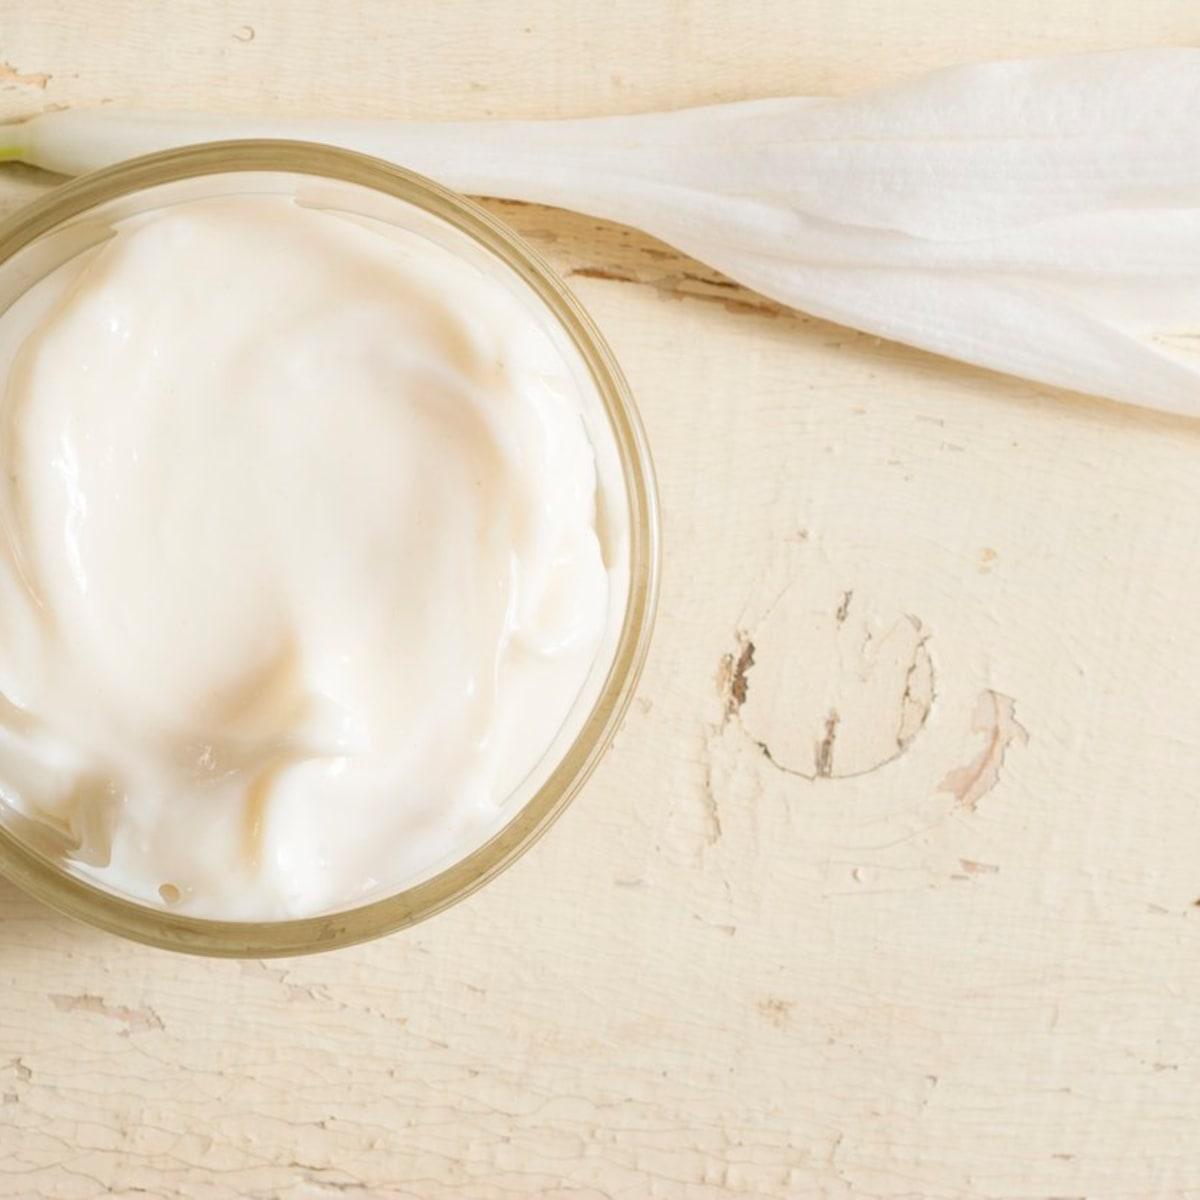 Homemade Anti Aging Face Cream